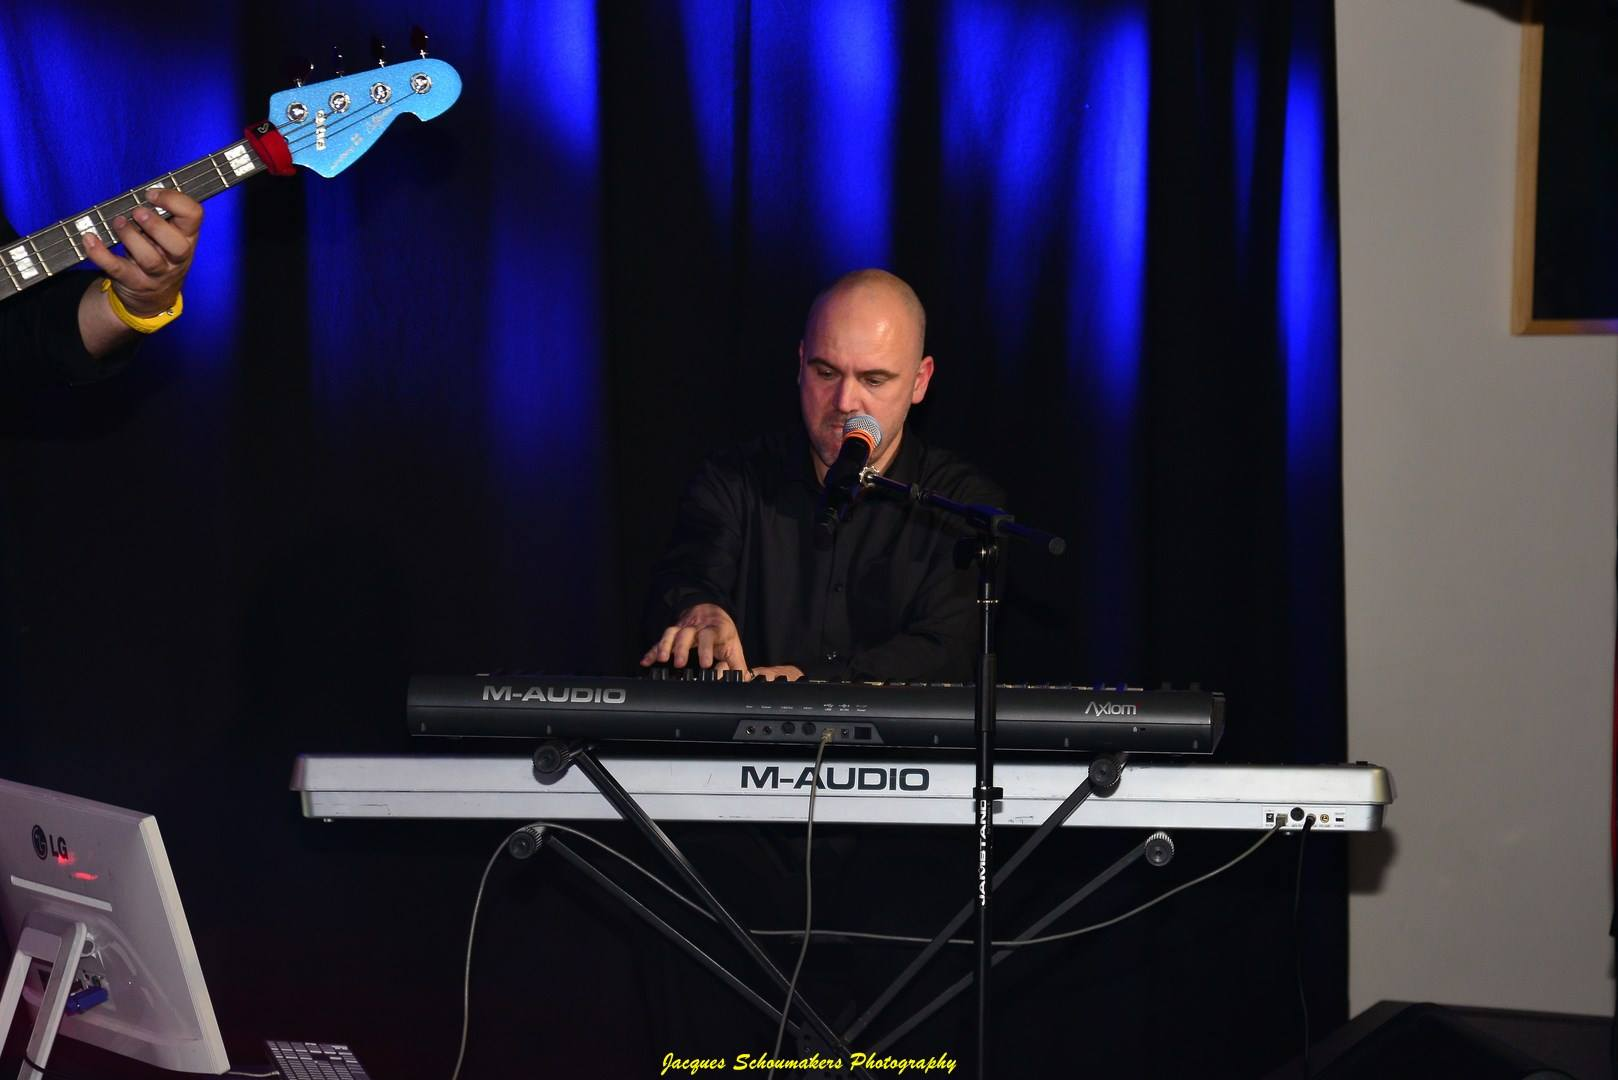 sos-recording-jacques-schoumakers-sebastian-for-elvis-memorial-show-franz-goovaerts-forelvis-10